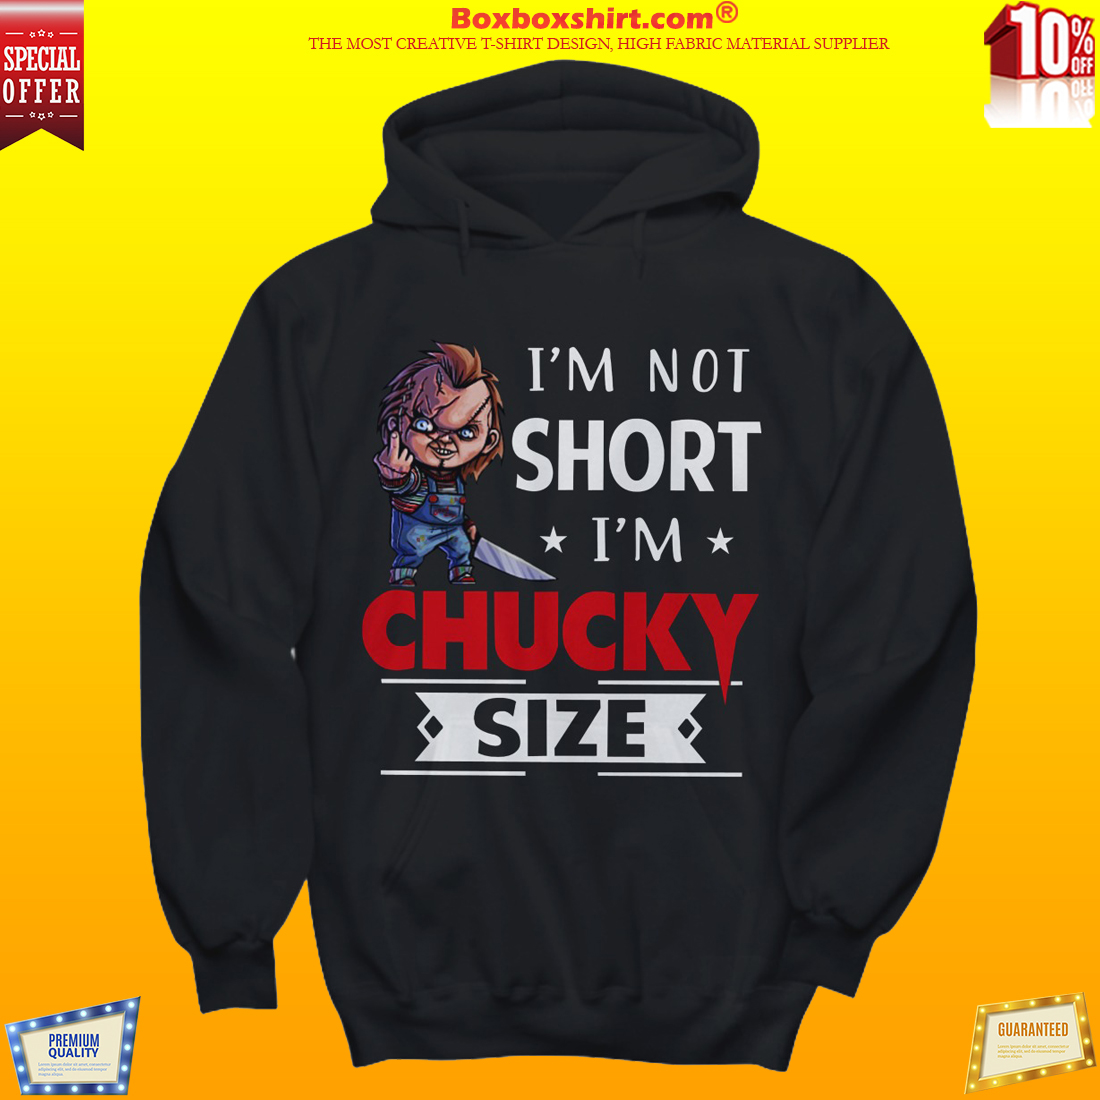 I'm not short Im Chucky size shirt and sweatshirt